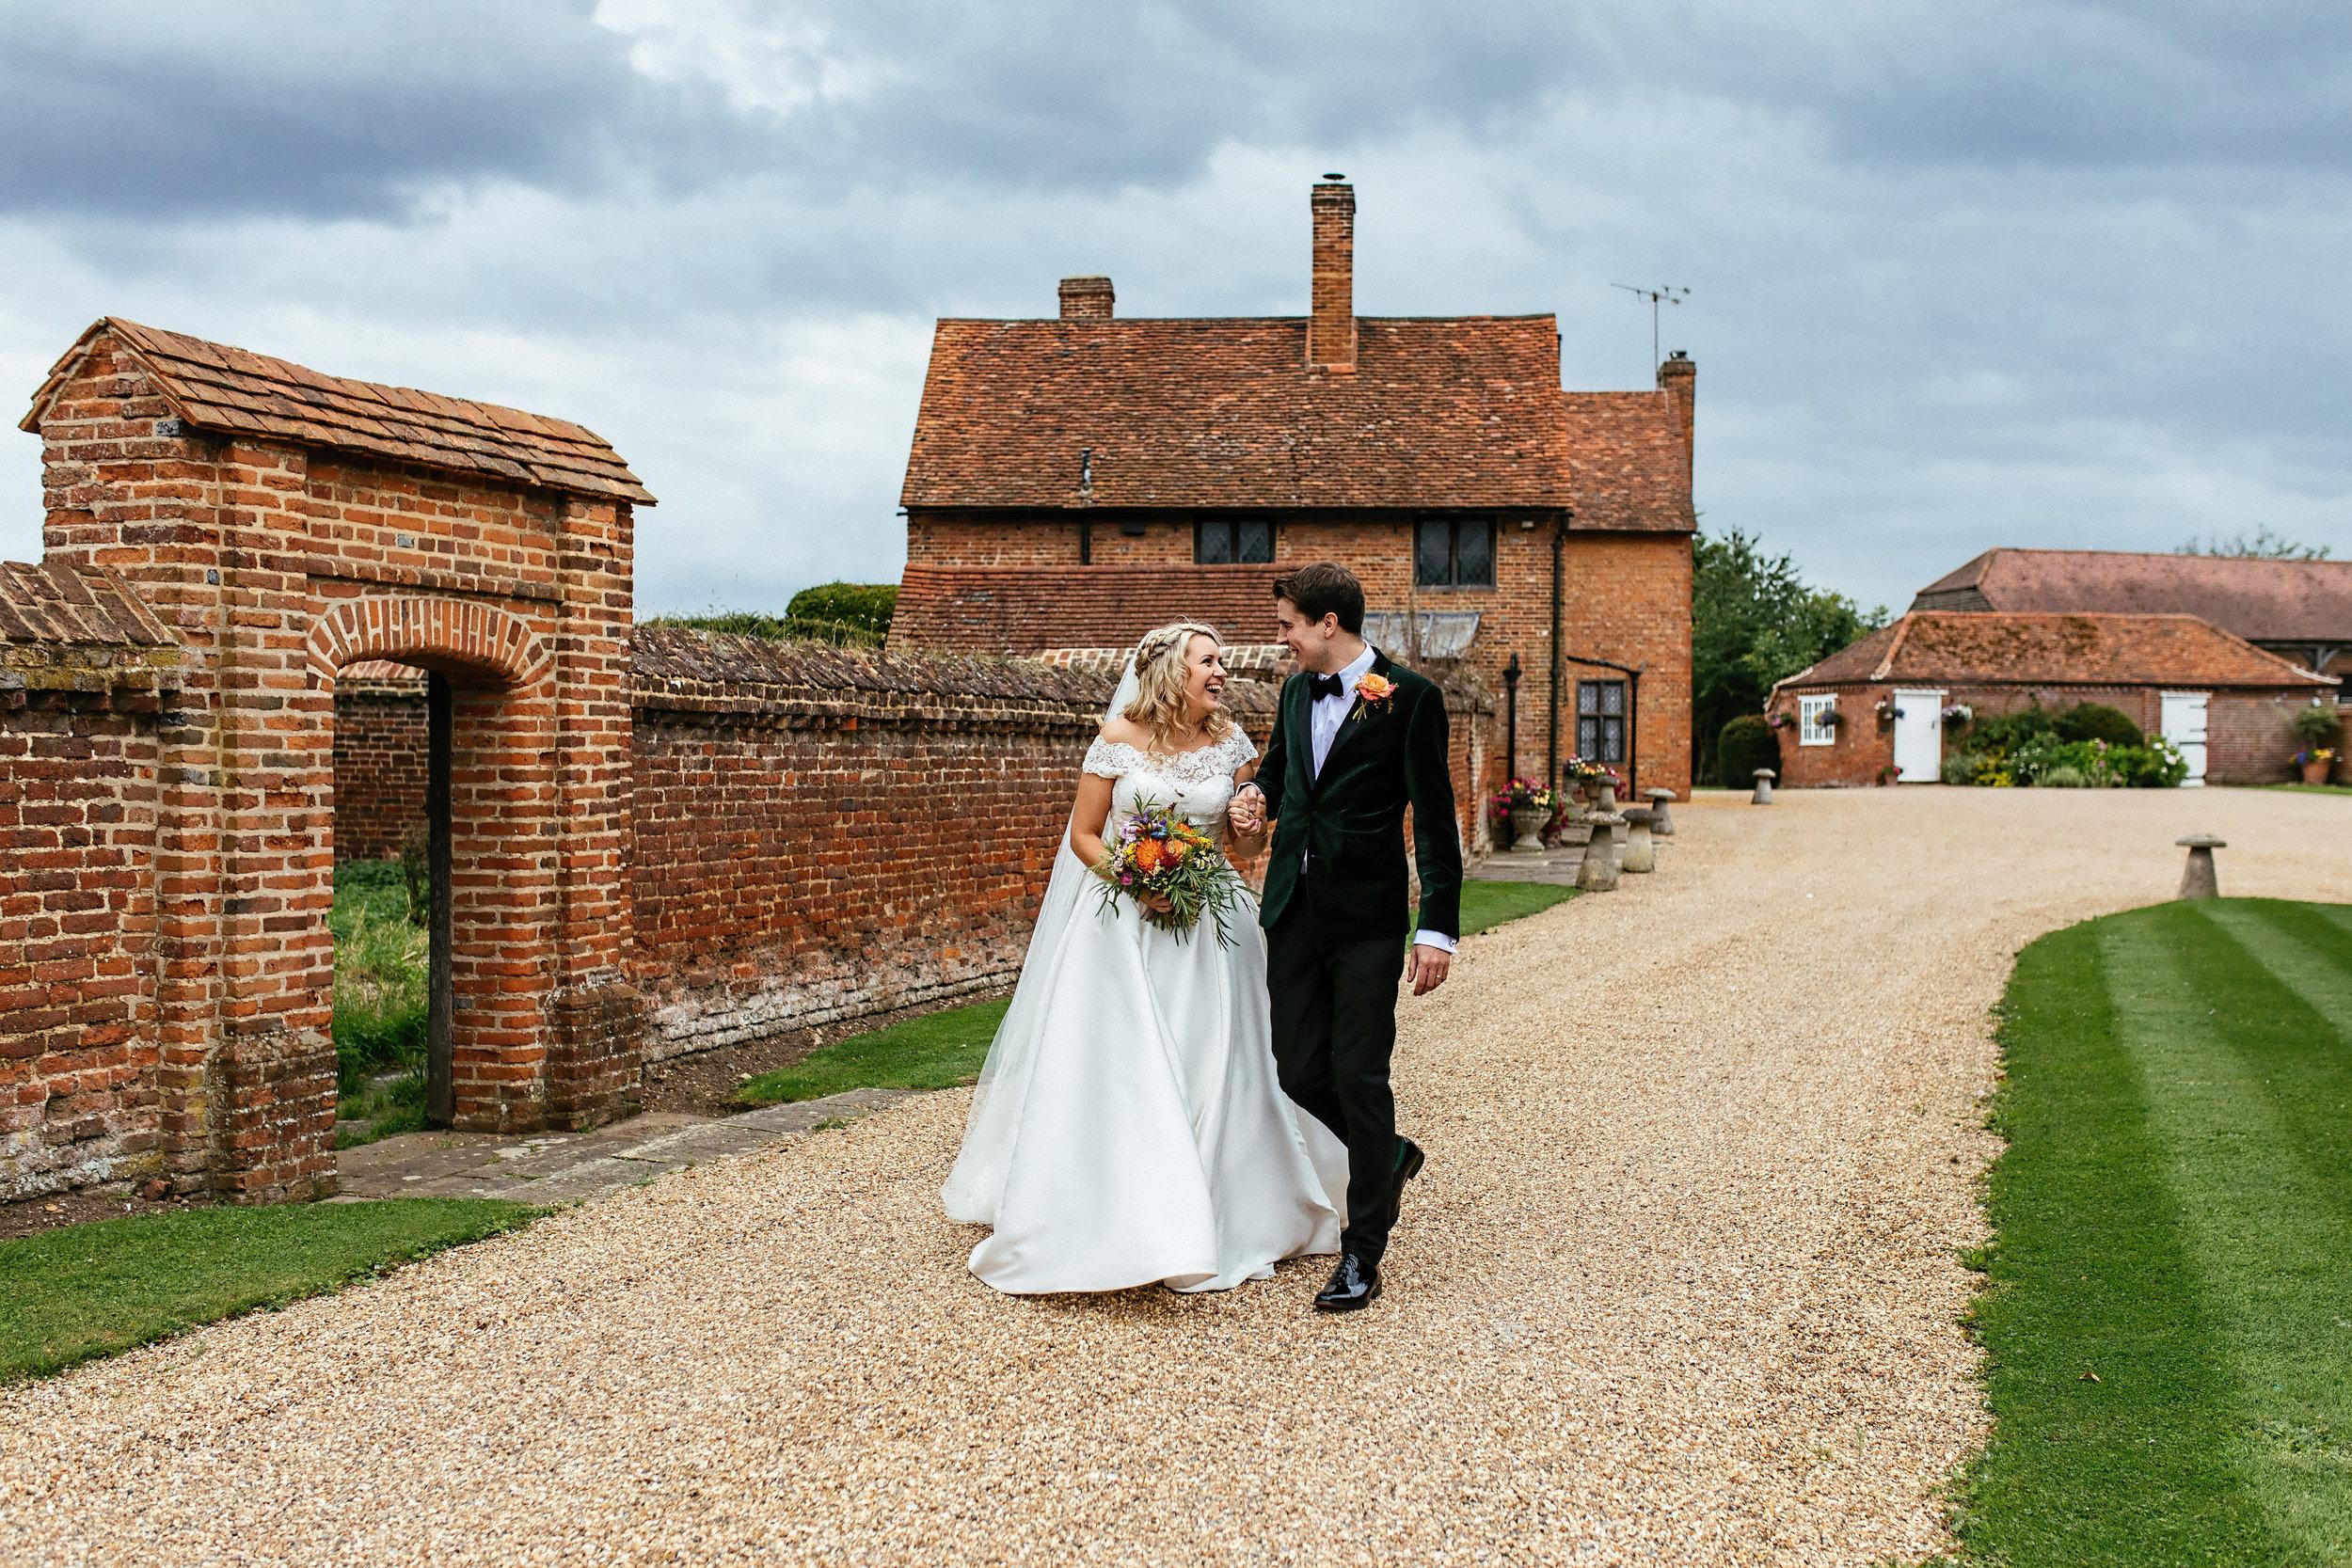 Tamara-and-Richard-Wedding-Highlights-48.jpg